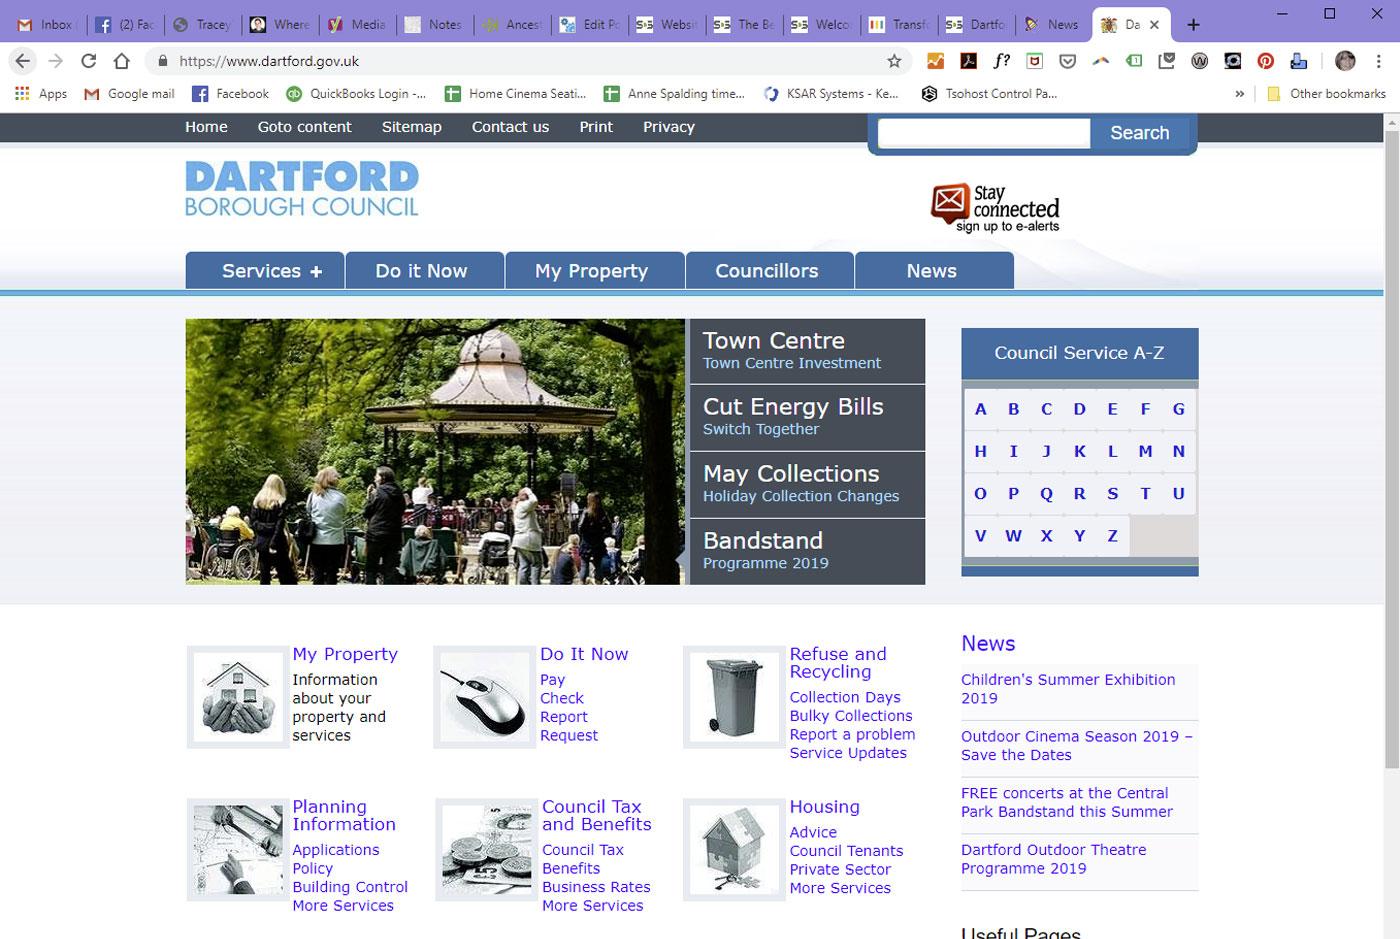 Dartford Borough Council website homepage